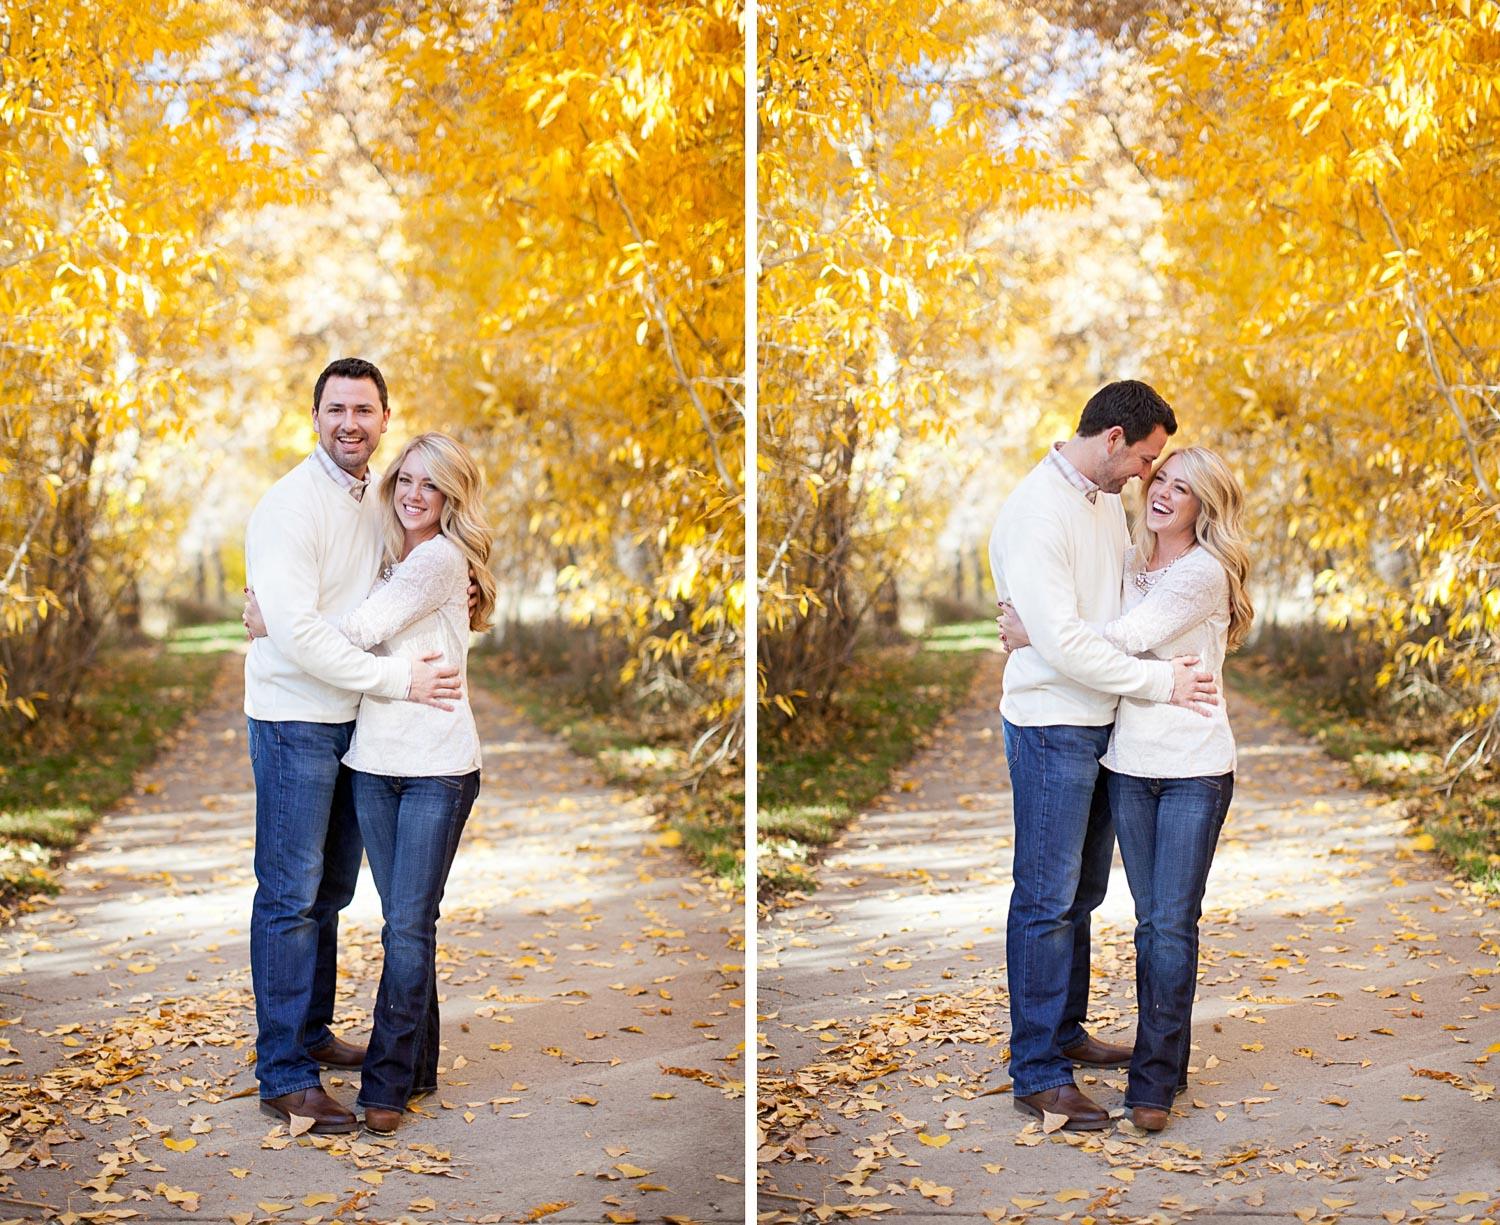 JMPHOTOART-Wedding-Photographer-50.jpg